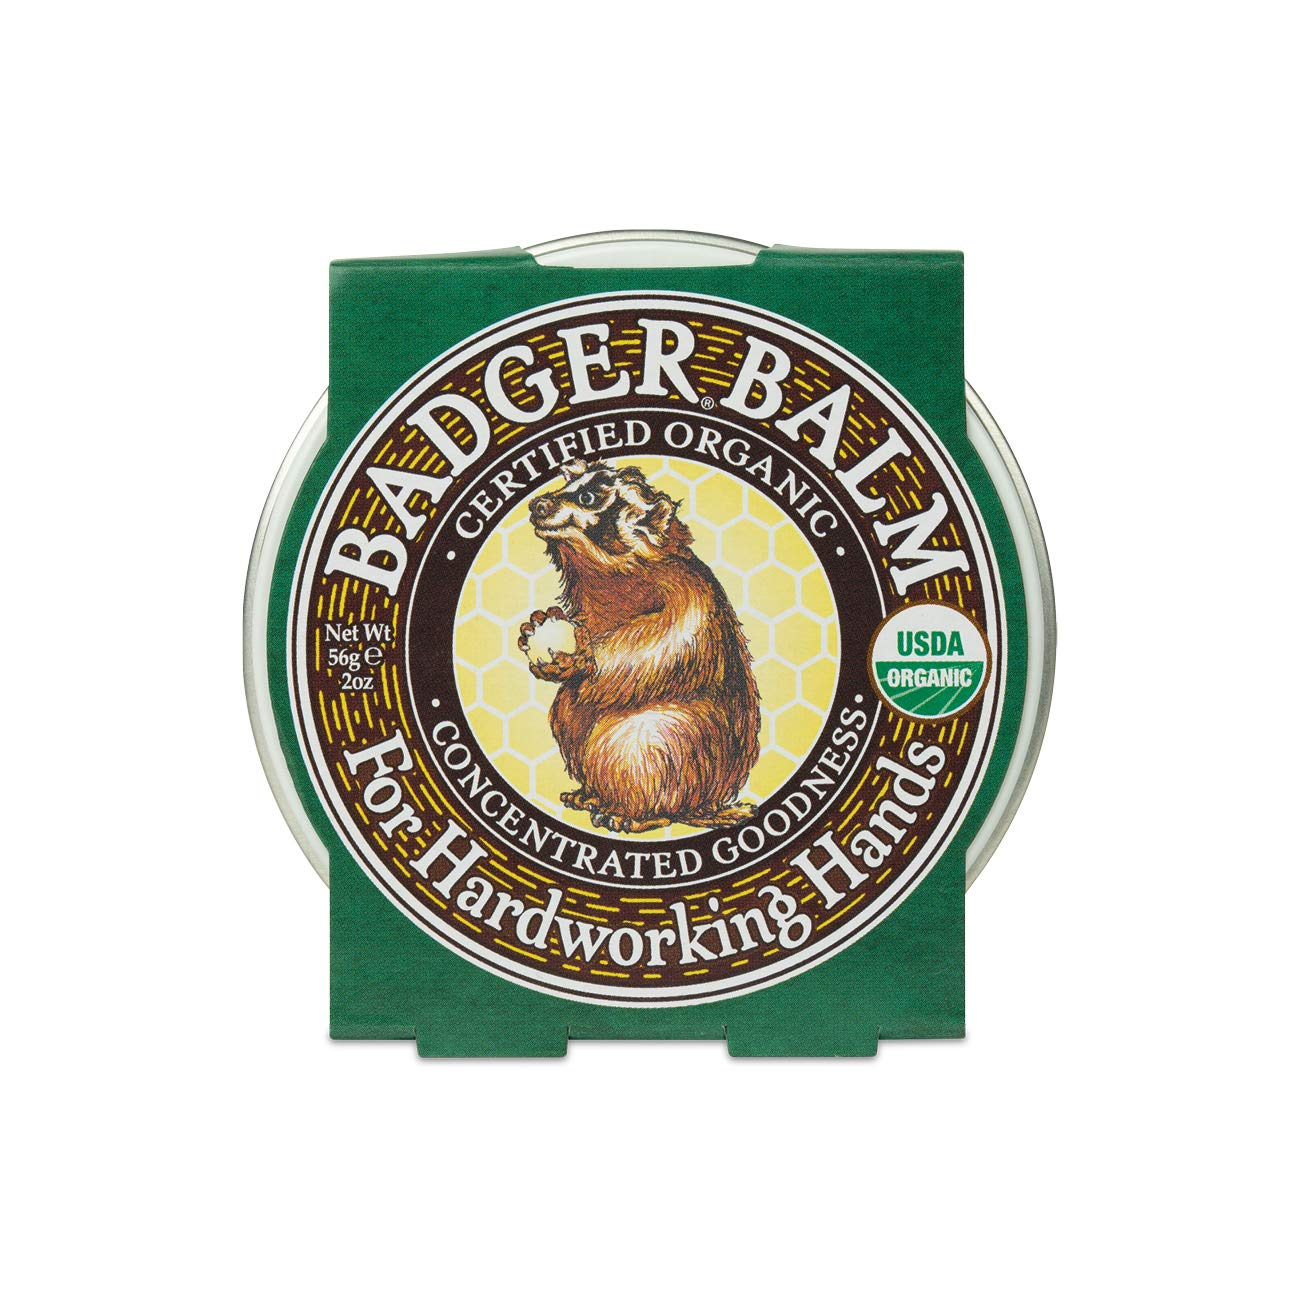 Badger - Hardworking Hands Healing Balm, Aloe Vera & Wintergreen, Working Hand Balm, Balm, for Dry Hands, Hand Moisturizer Balm, Certified Organic Hand Balm, Hand Repair Balm, 2 oz